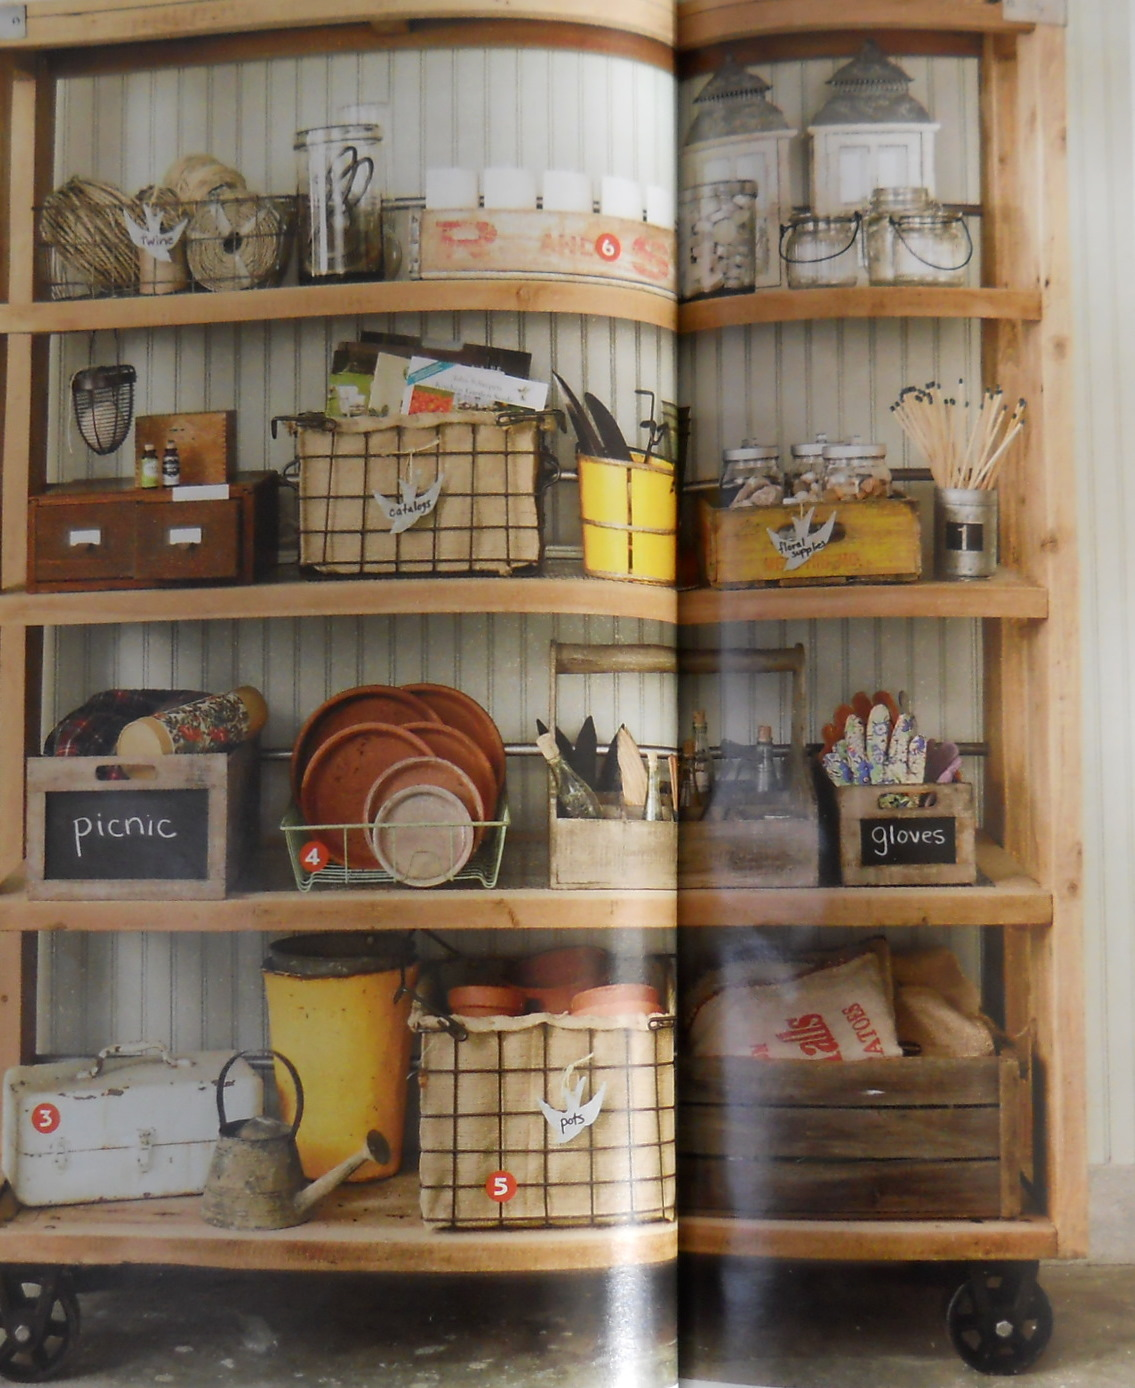 50 Best Diy Shed Organization Ideas Images On Pinterest: Shedplan: Small Garden Sheds With Shelves